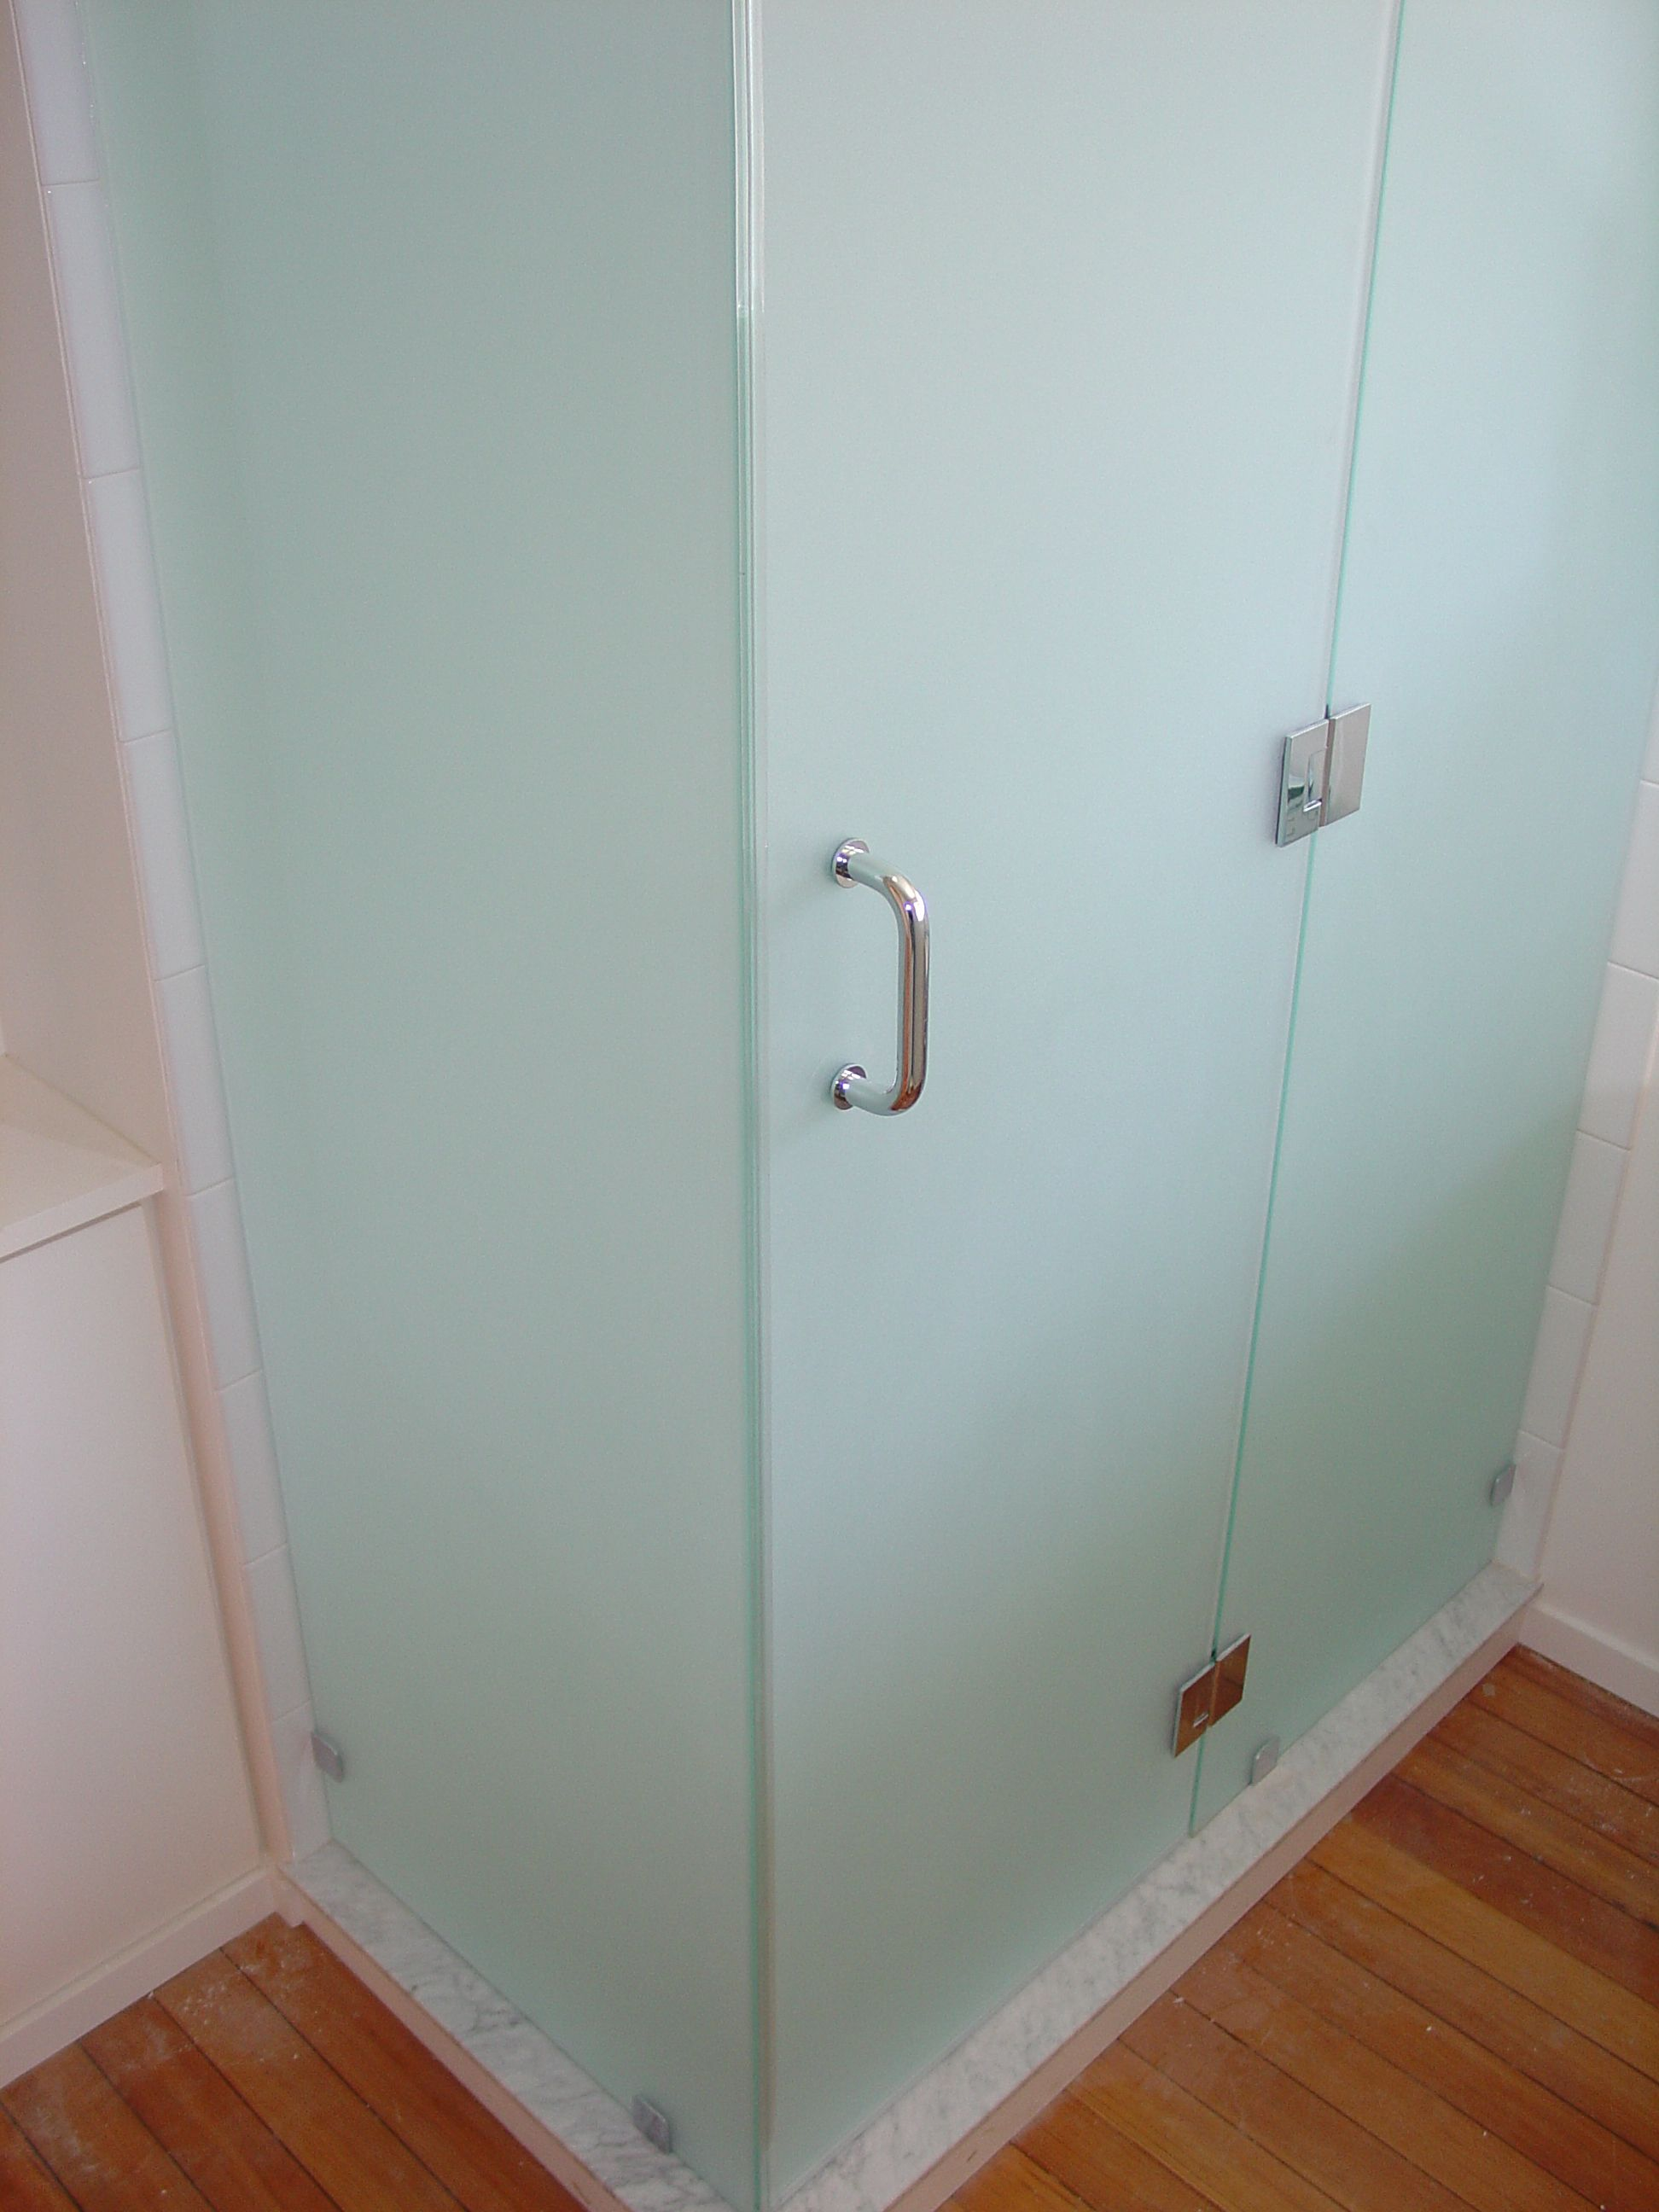 Frosted Shower Door Will Let In Light But Still Provide